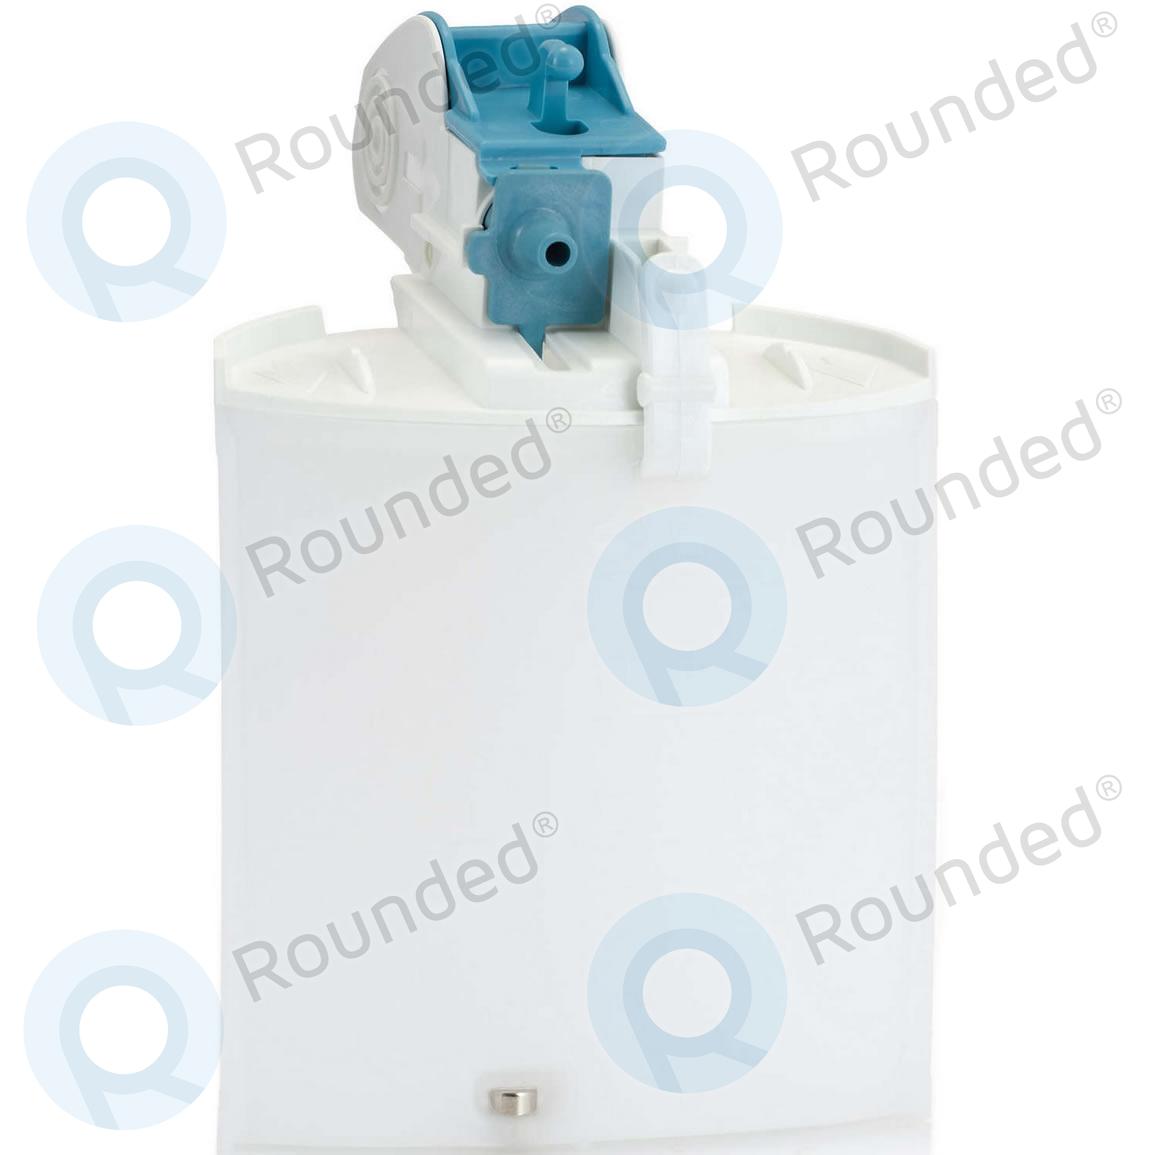 philips senseo latte select hd7854 hd7854 60 milk. Black Bedroom Furniture Sets. Home Design Ideas